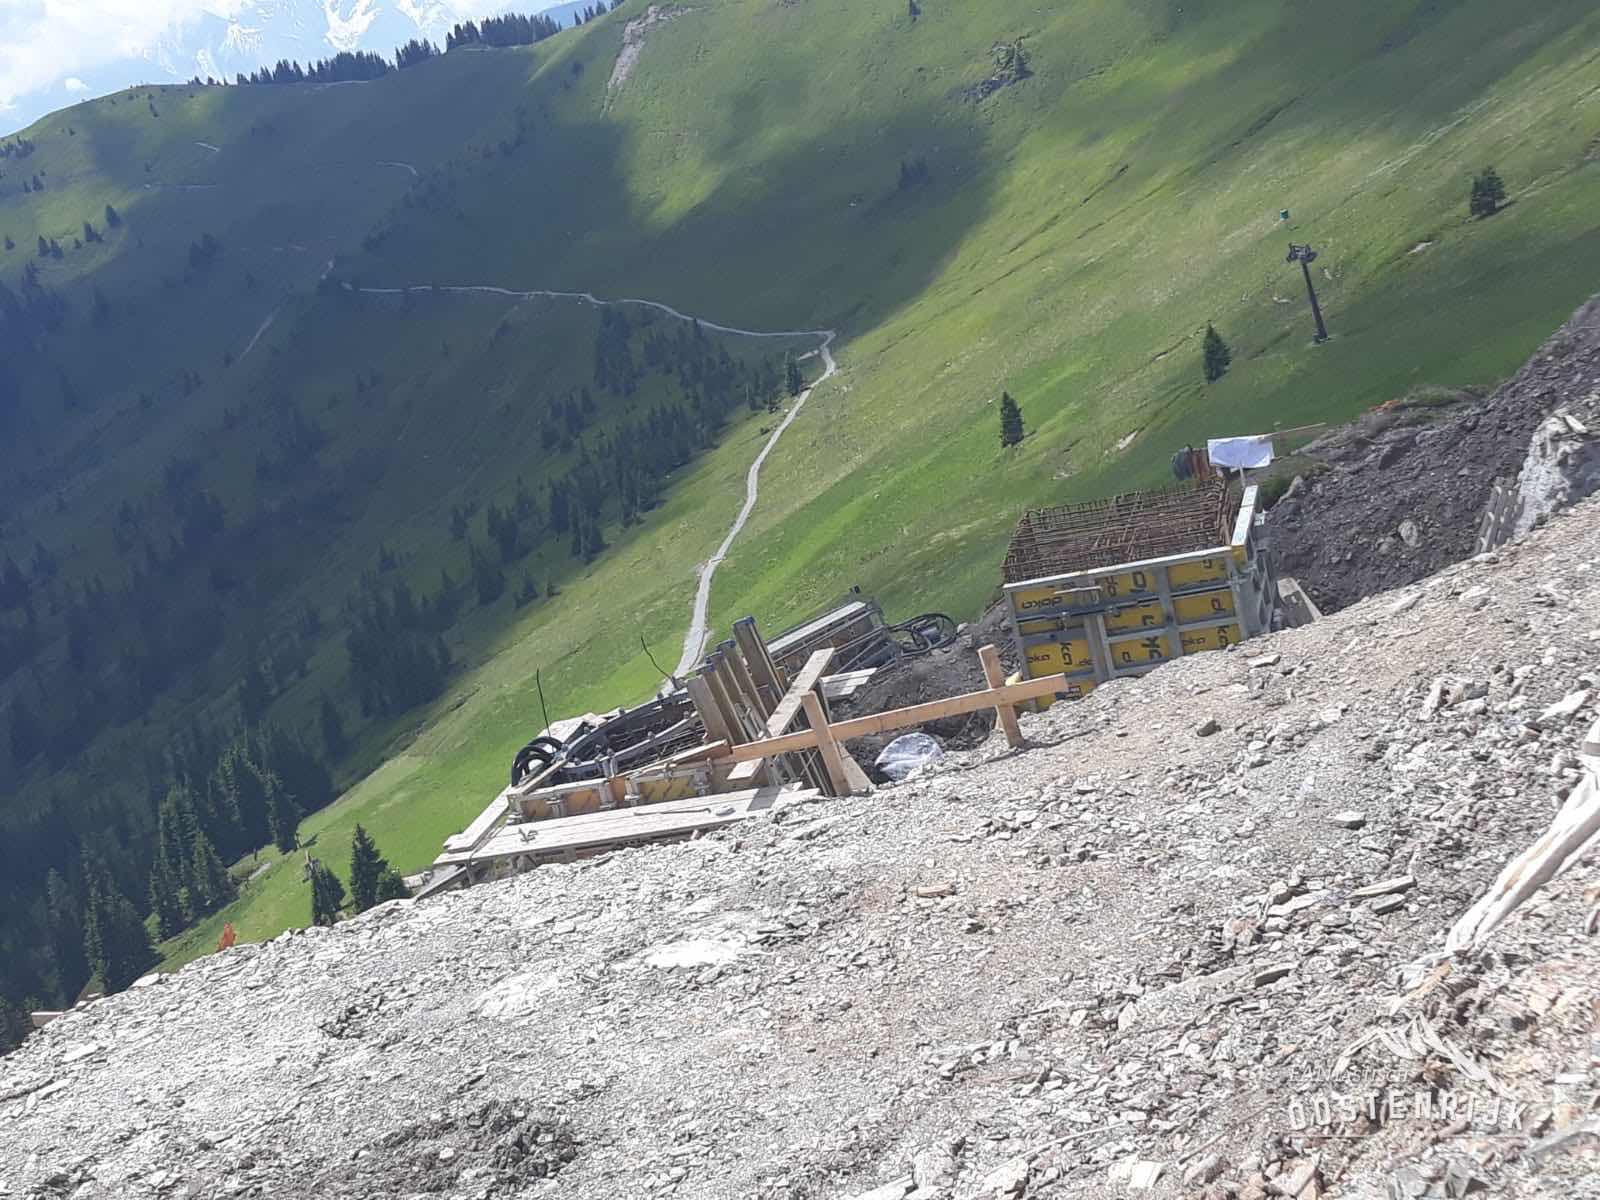 Asitzmuldebahn